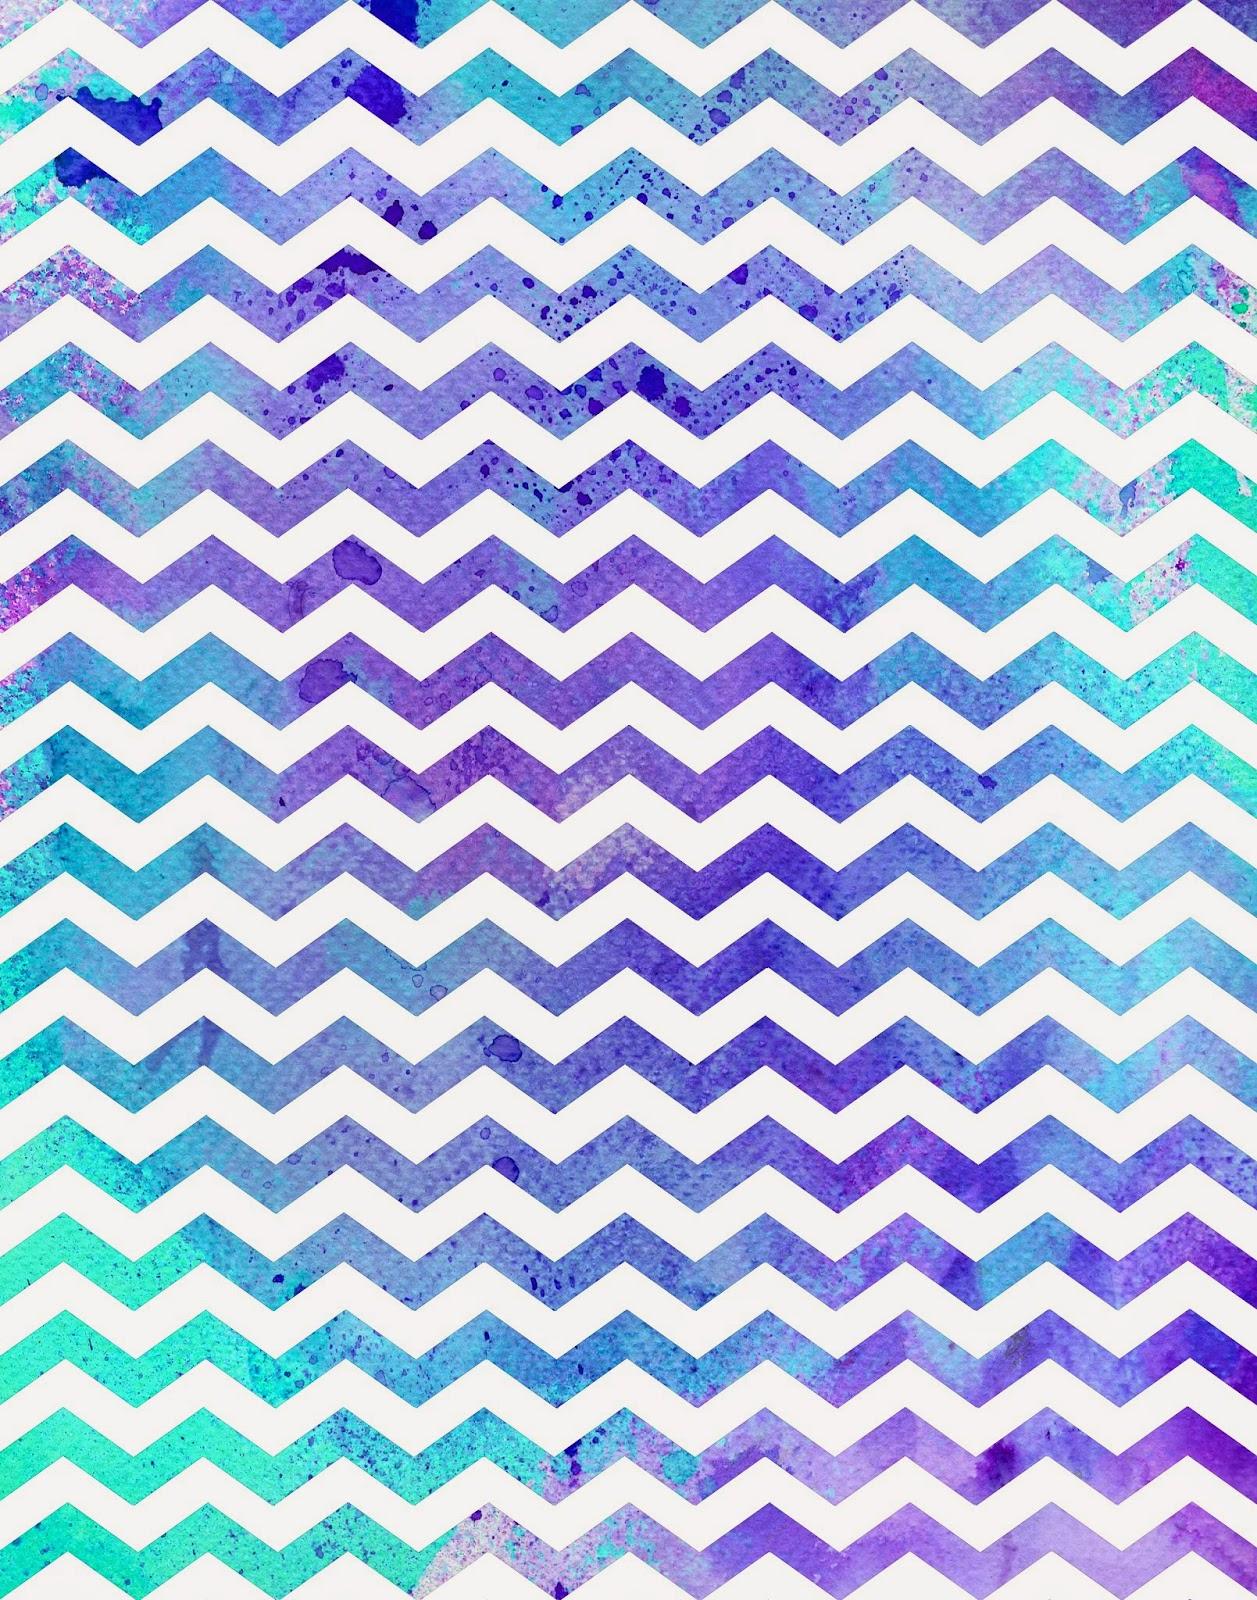 Purple and white chevron background